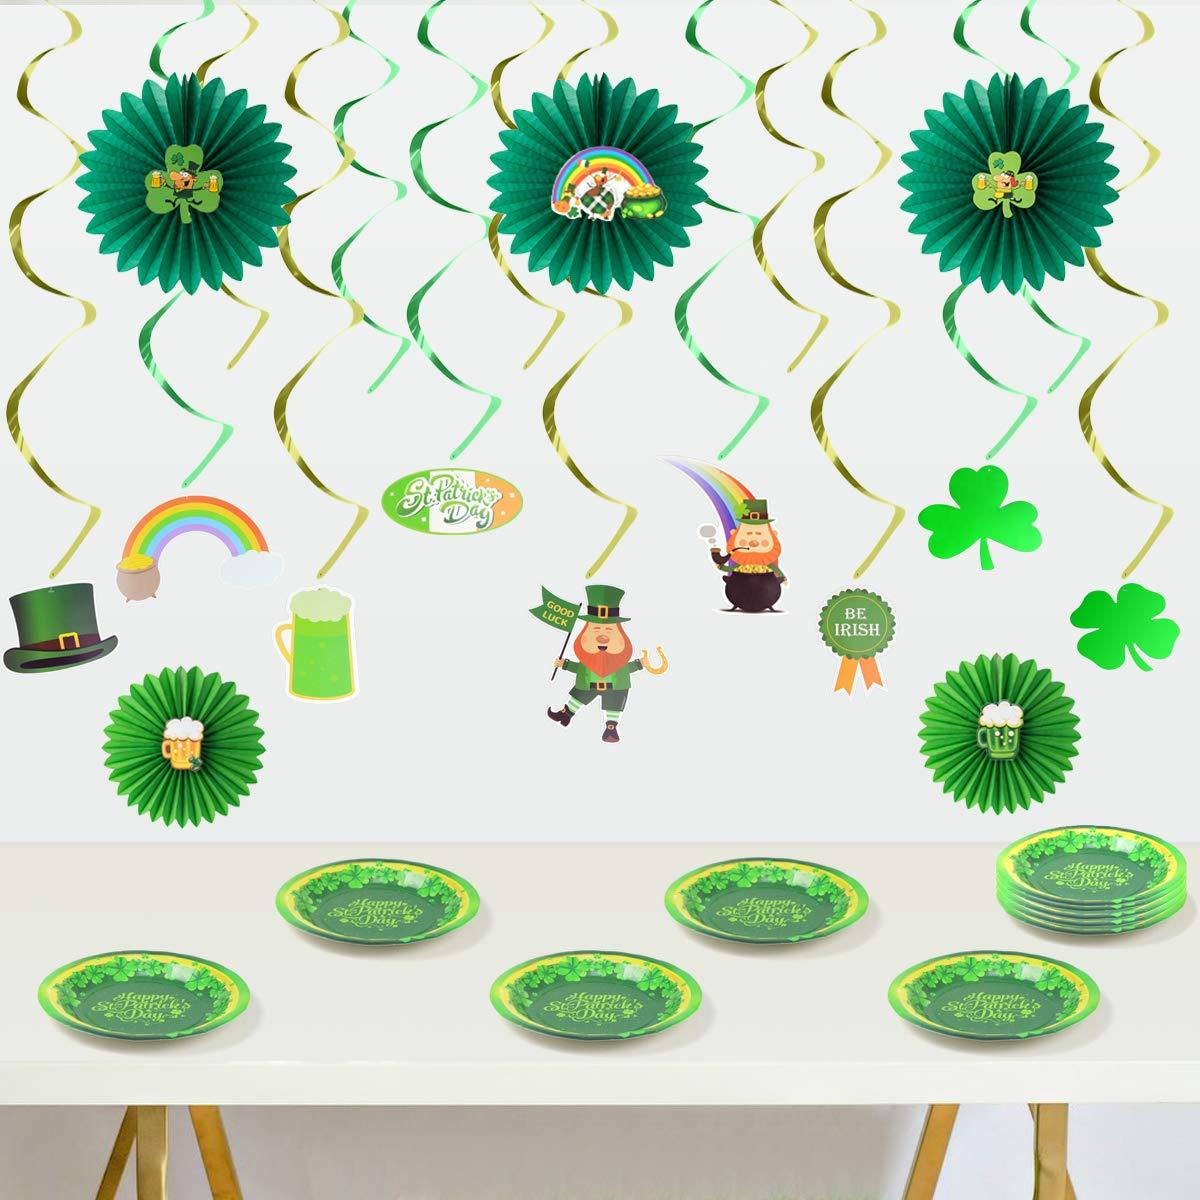 JOYIN St Patricks Day Colorful Foil Hanging Swirls with Lucky Irish Green Shamrock and Leprechauns Saint Patricks Pot-O-Gold Centerpiece Tissue St Patricks Poms Party Decorations